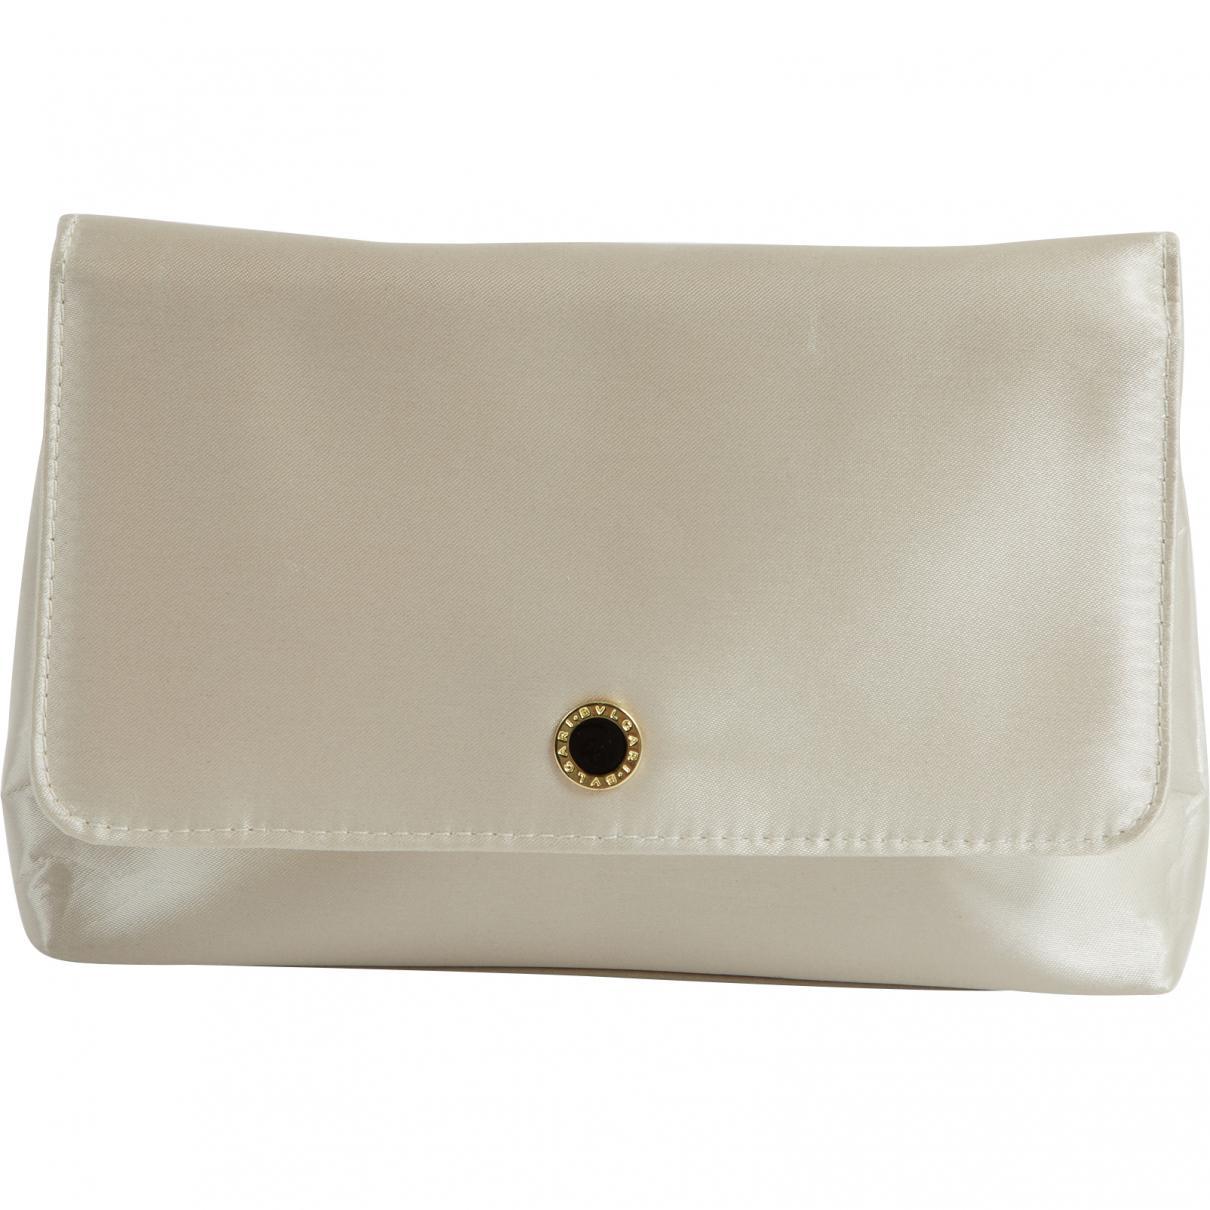 Bulgari Pre-owned - Cloth clutch bag v1MsKwBVUW